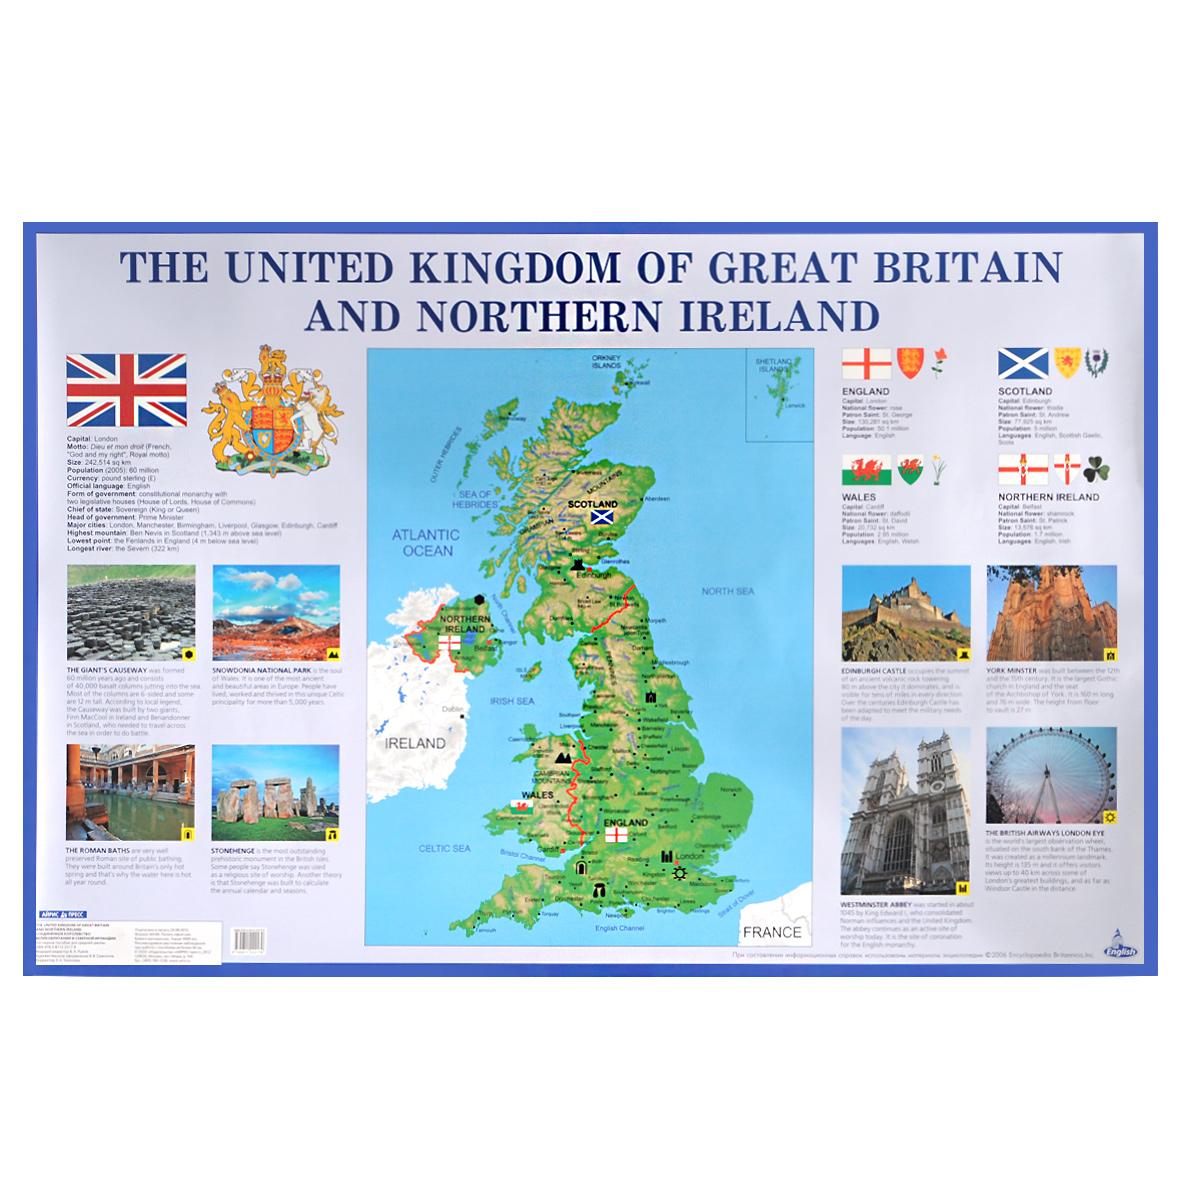 The United Kingdom of Great Britain and Northern Ireland / Соединенное Королевство Великобритании и Северной Ирландии . Наглядное пособие